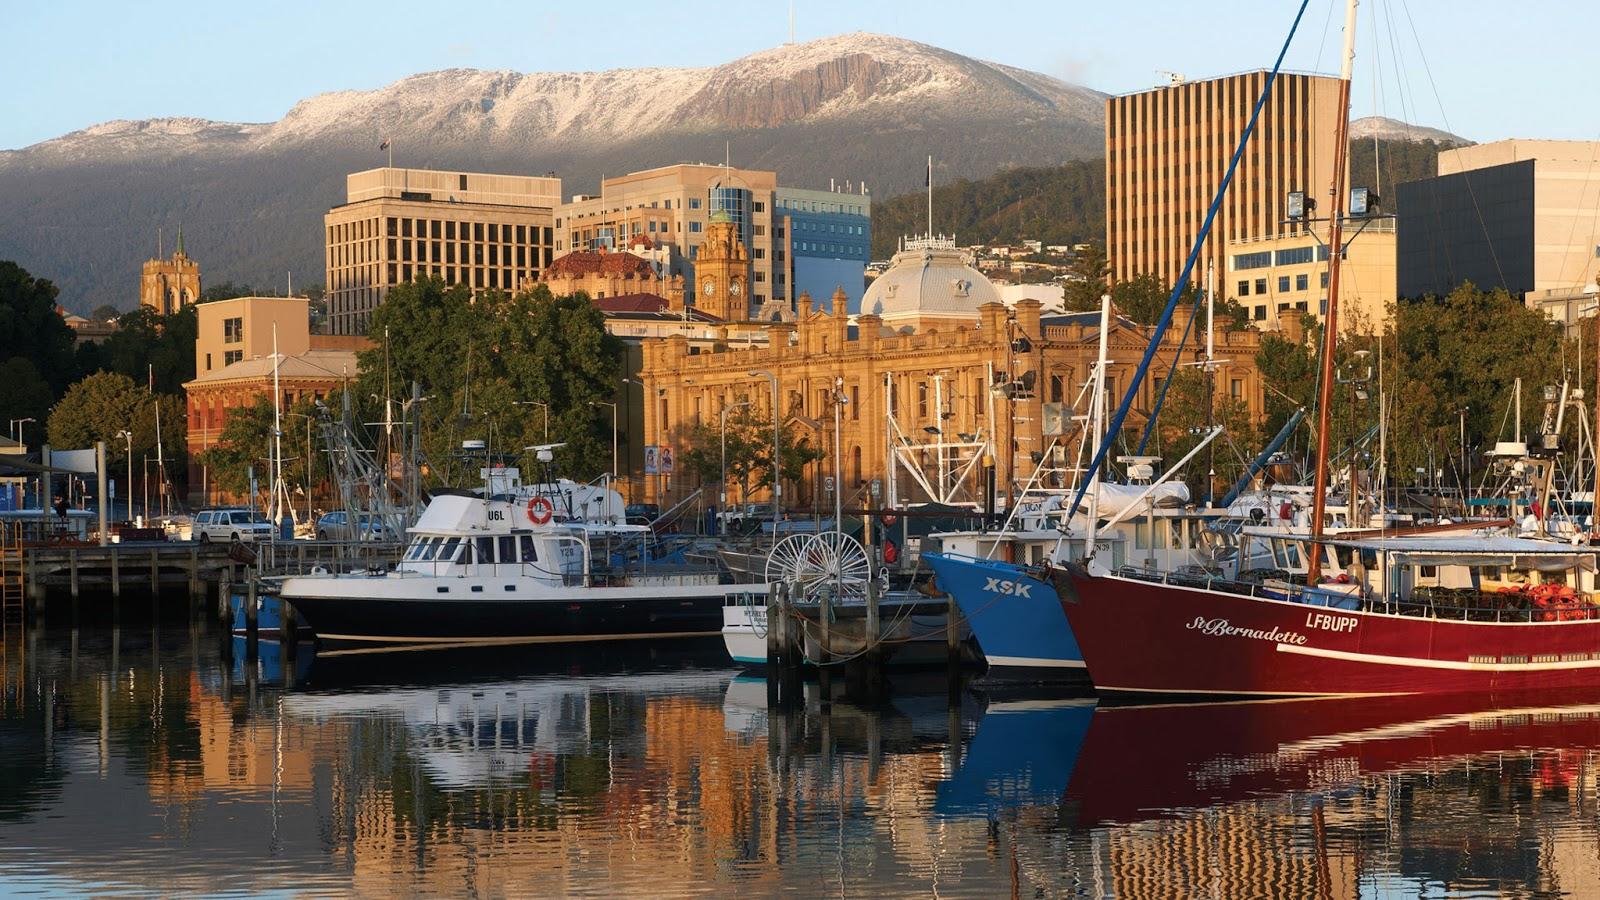 Burnie Australia  city photos gallery : ... Australia, Pacific Hobart, Launceston, Devonport, Burnie, Somerset